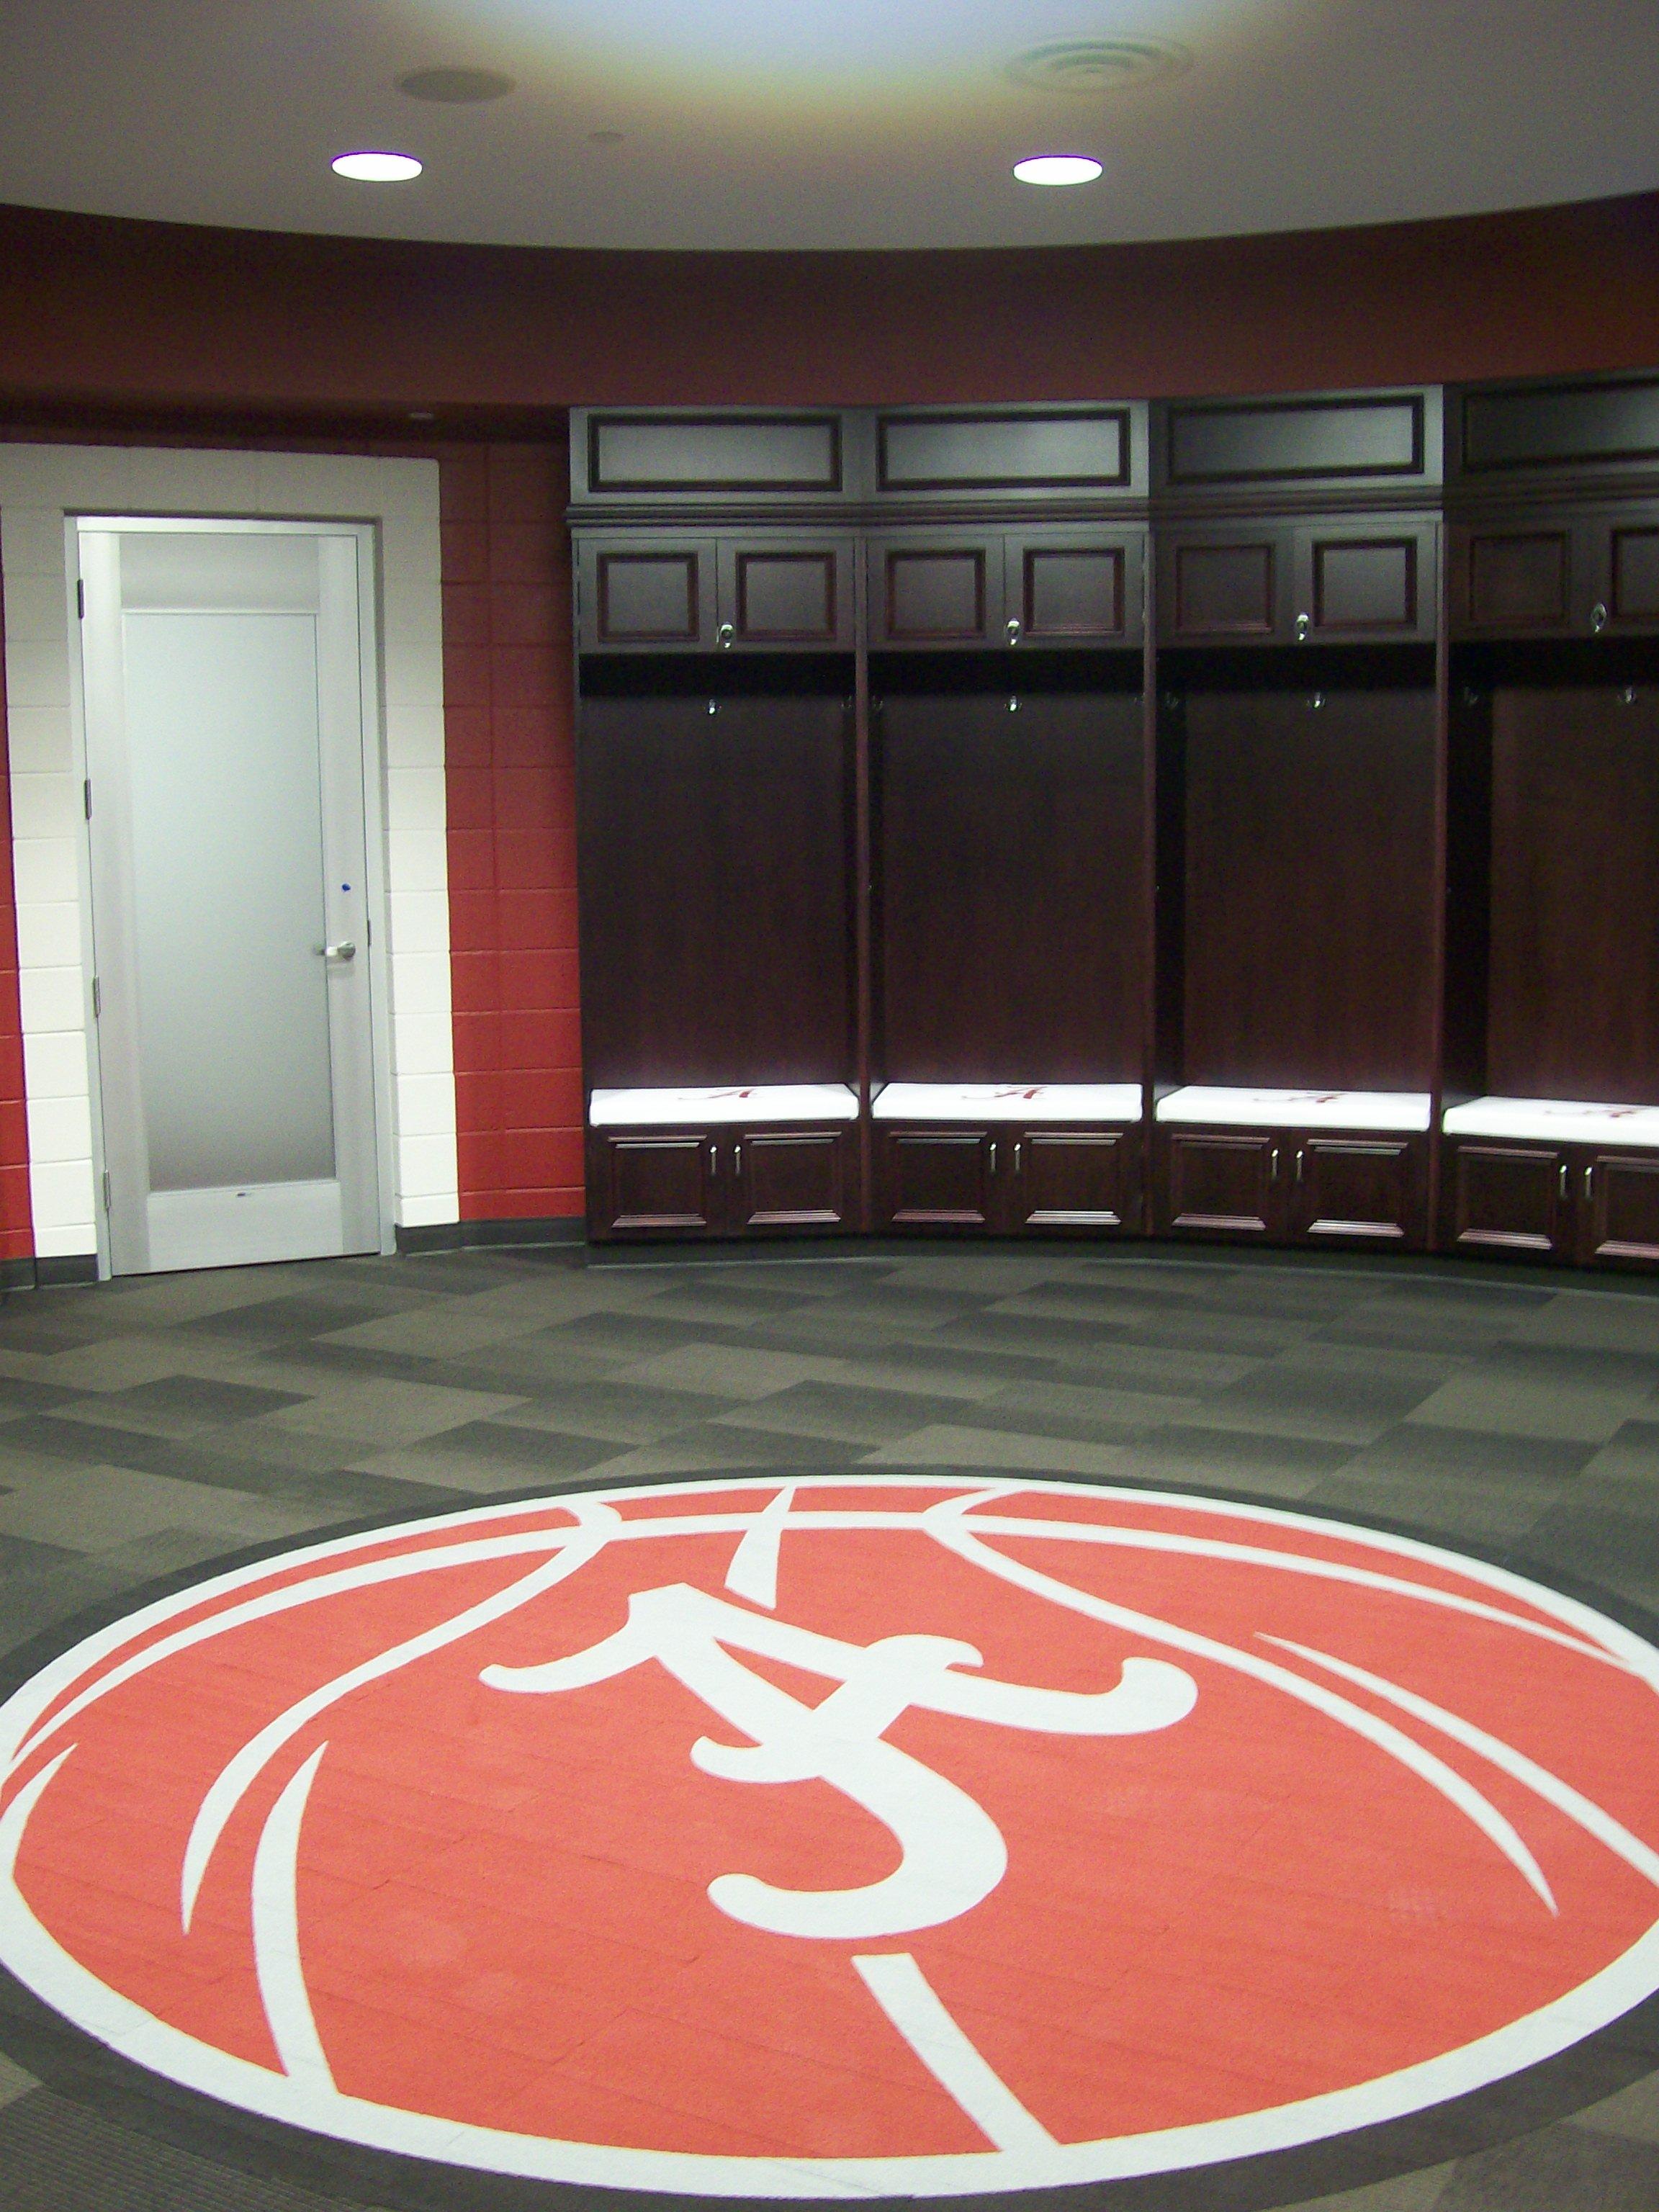 Harley color carpet tiles - University Of Alabama Basketball Locker Room